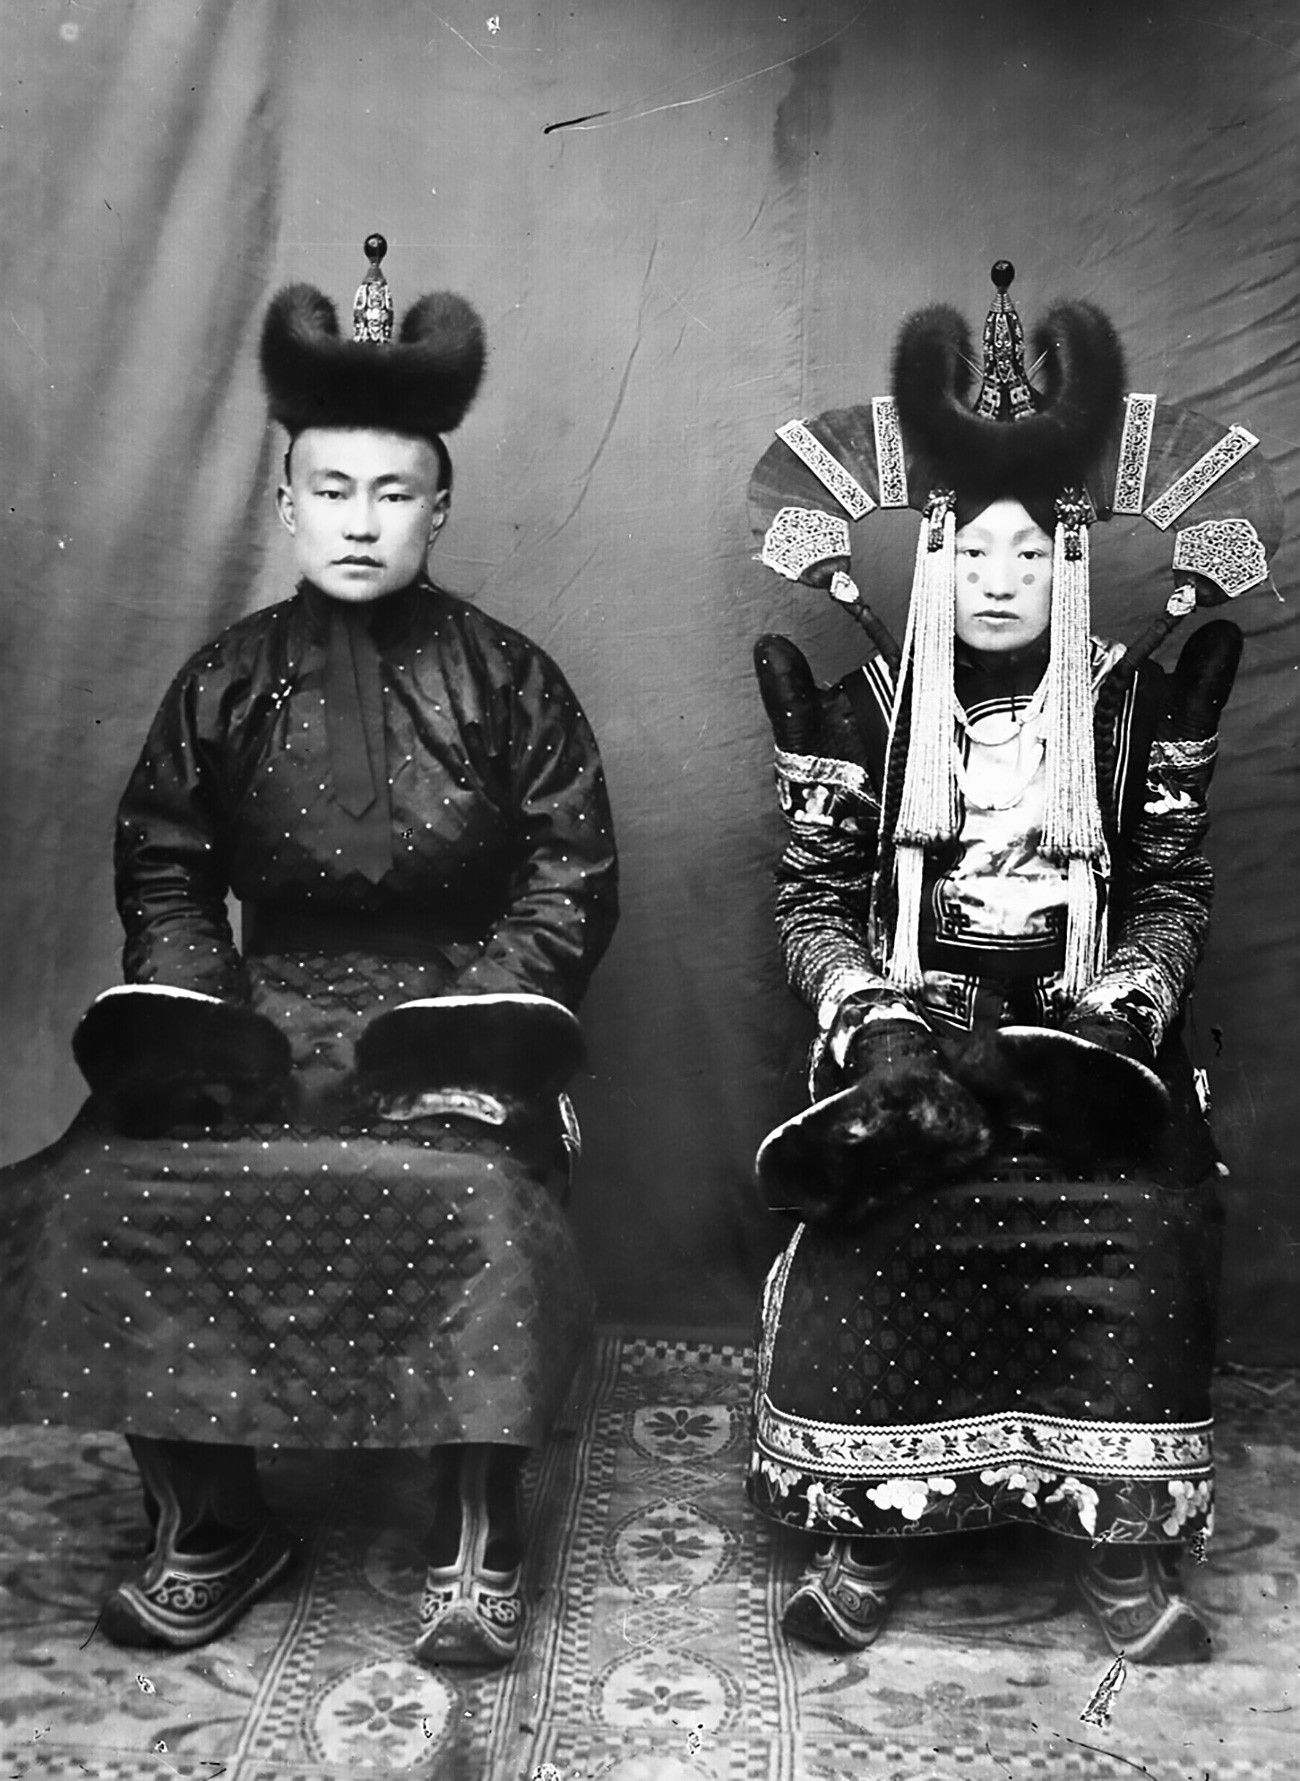 Sepasang pengantin mengenakan pakaian tradisional Mongolia pada 1920-an.